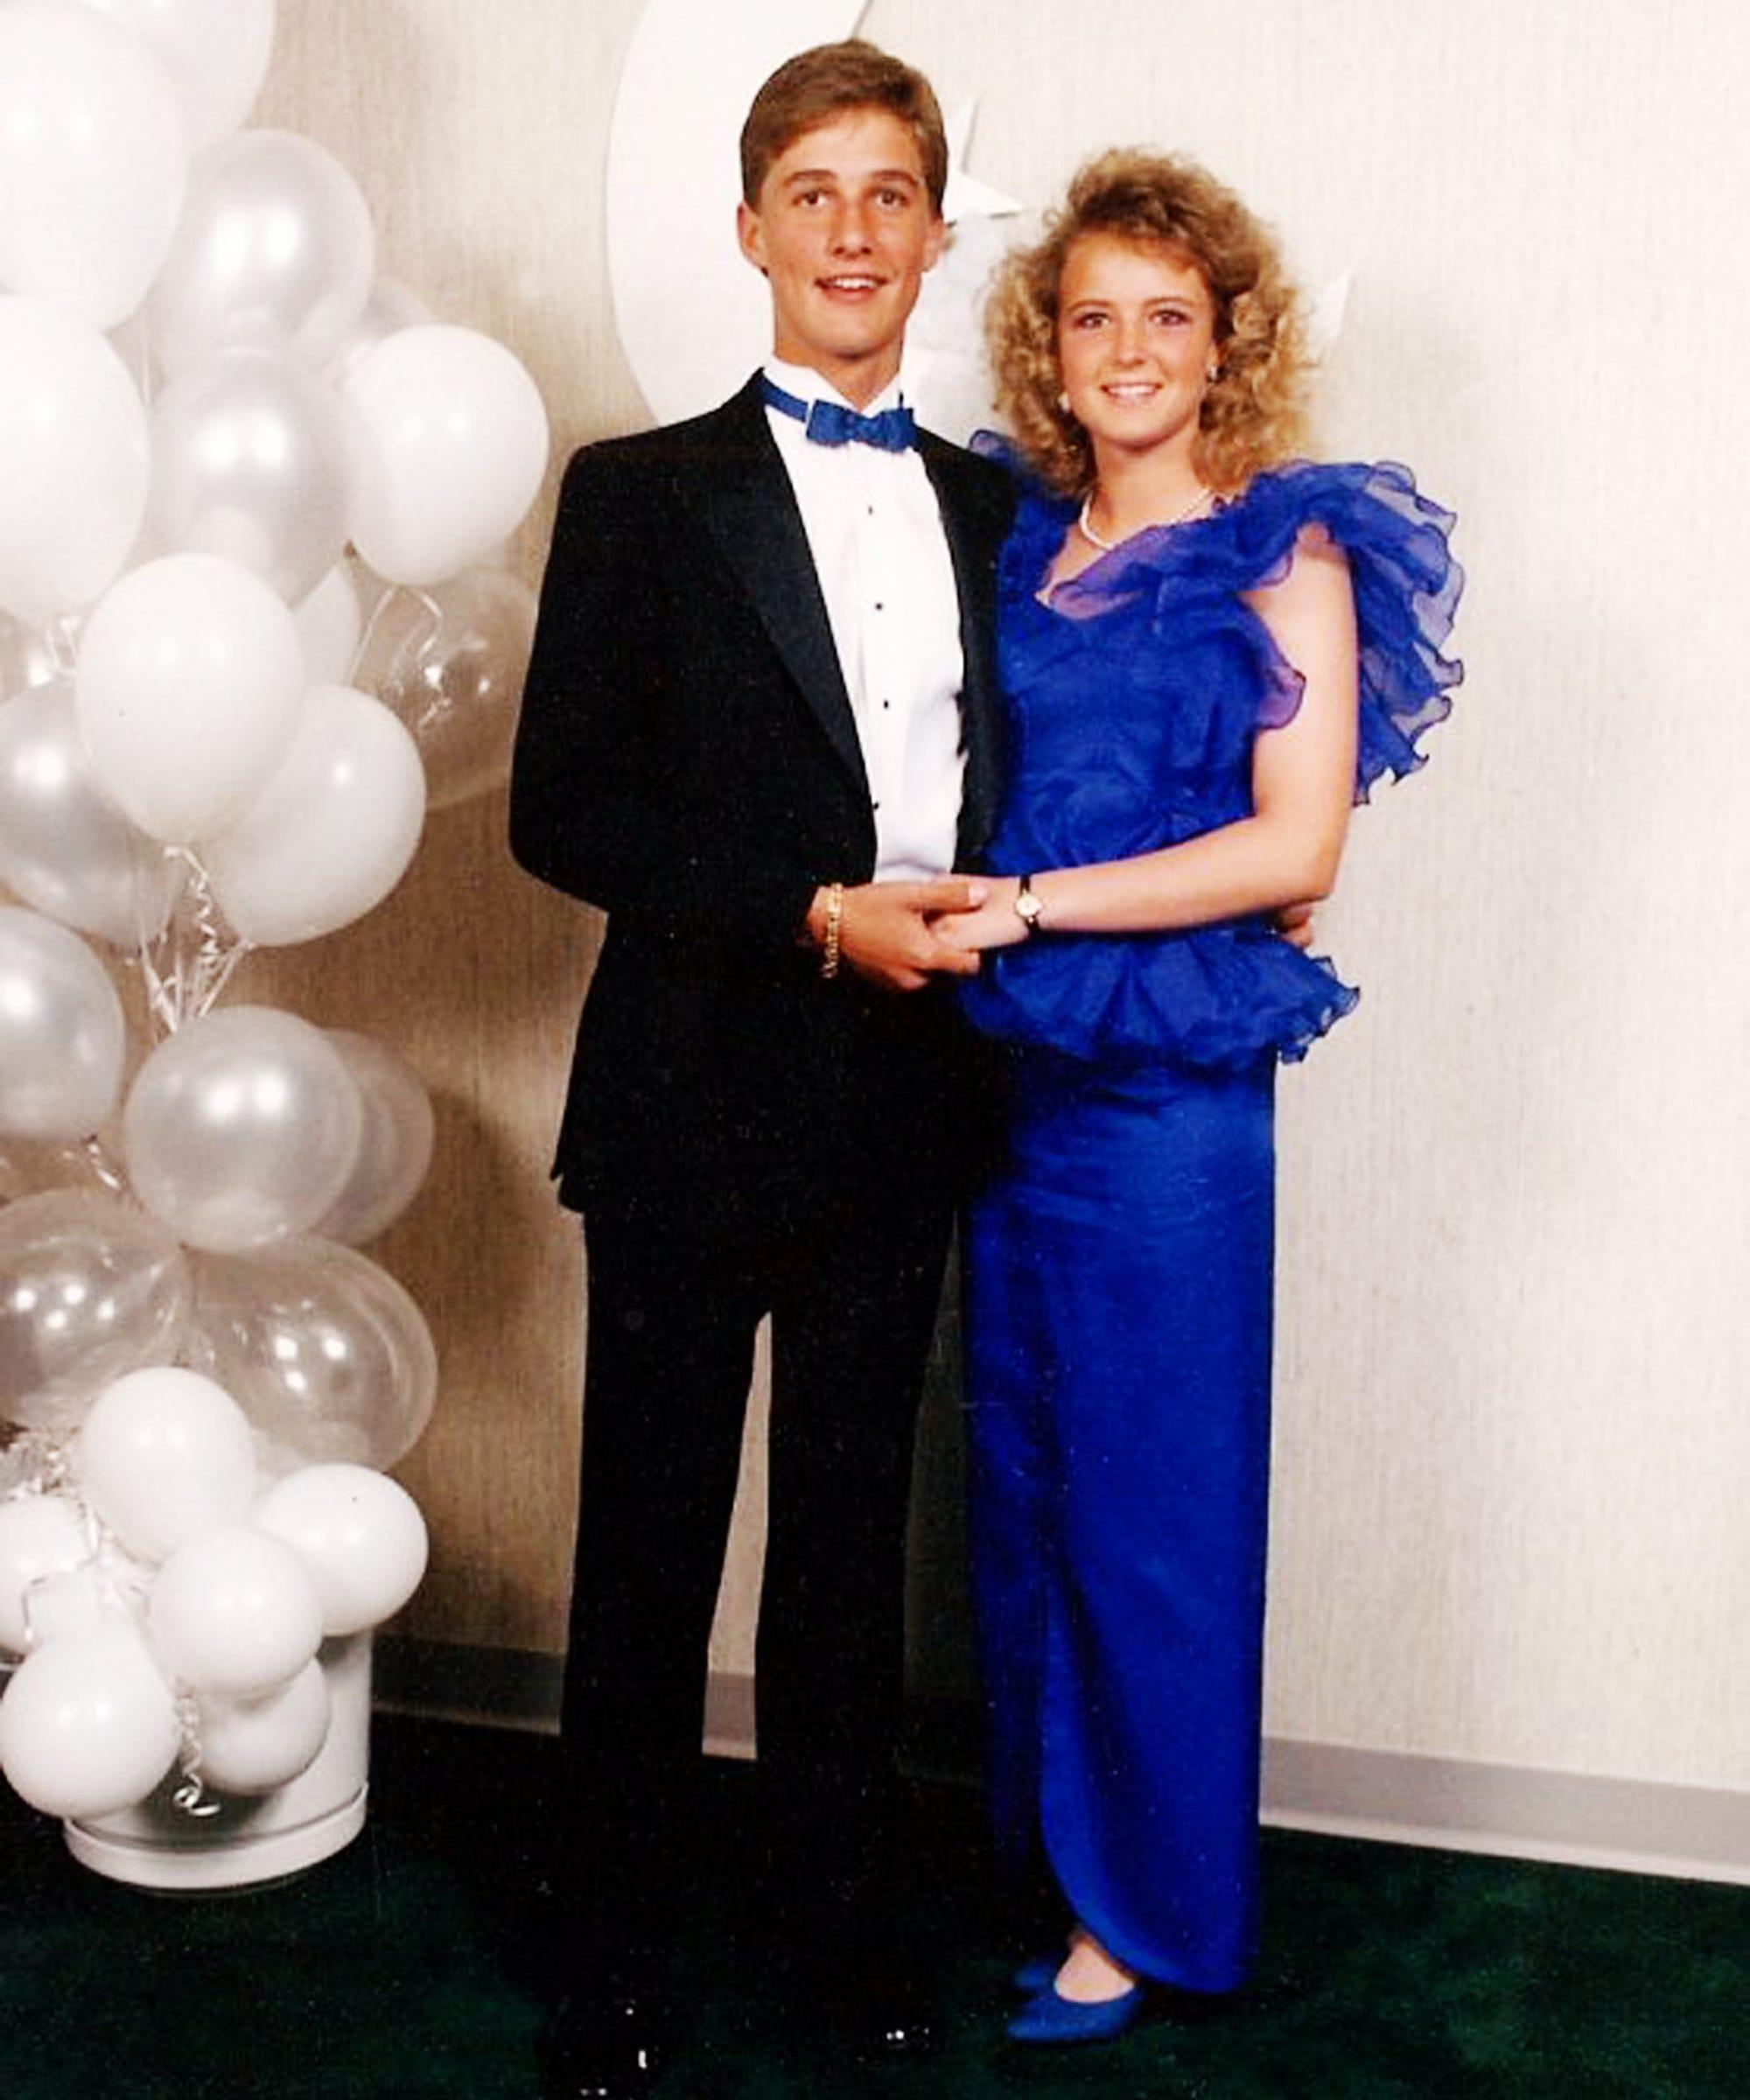 Prom dating tips Salem Kostenlose dating iowa Wolfsburg.